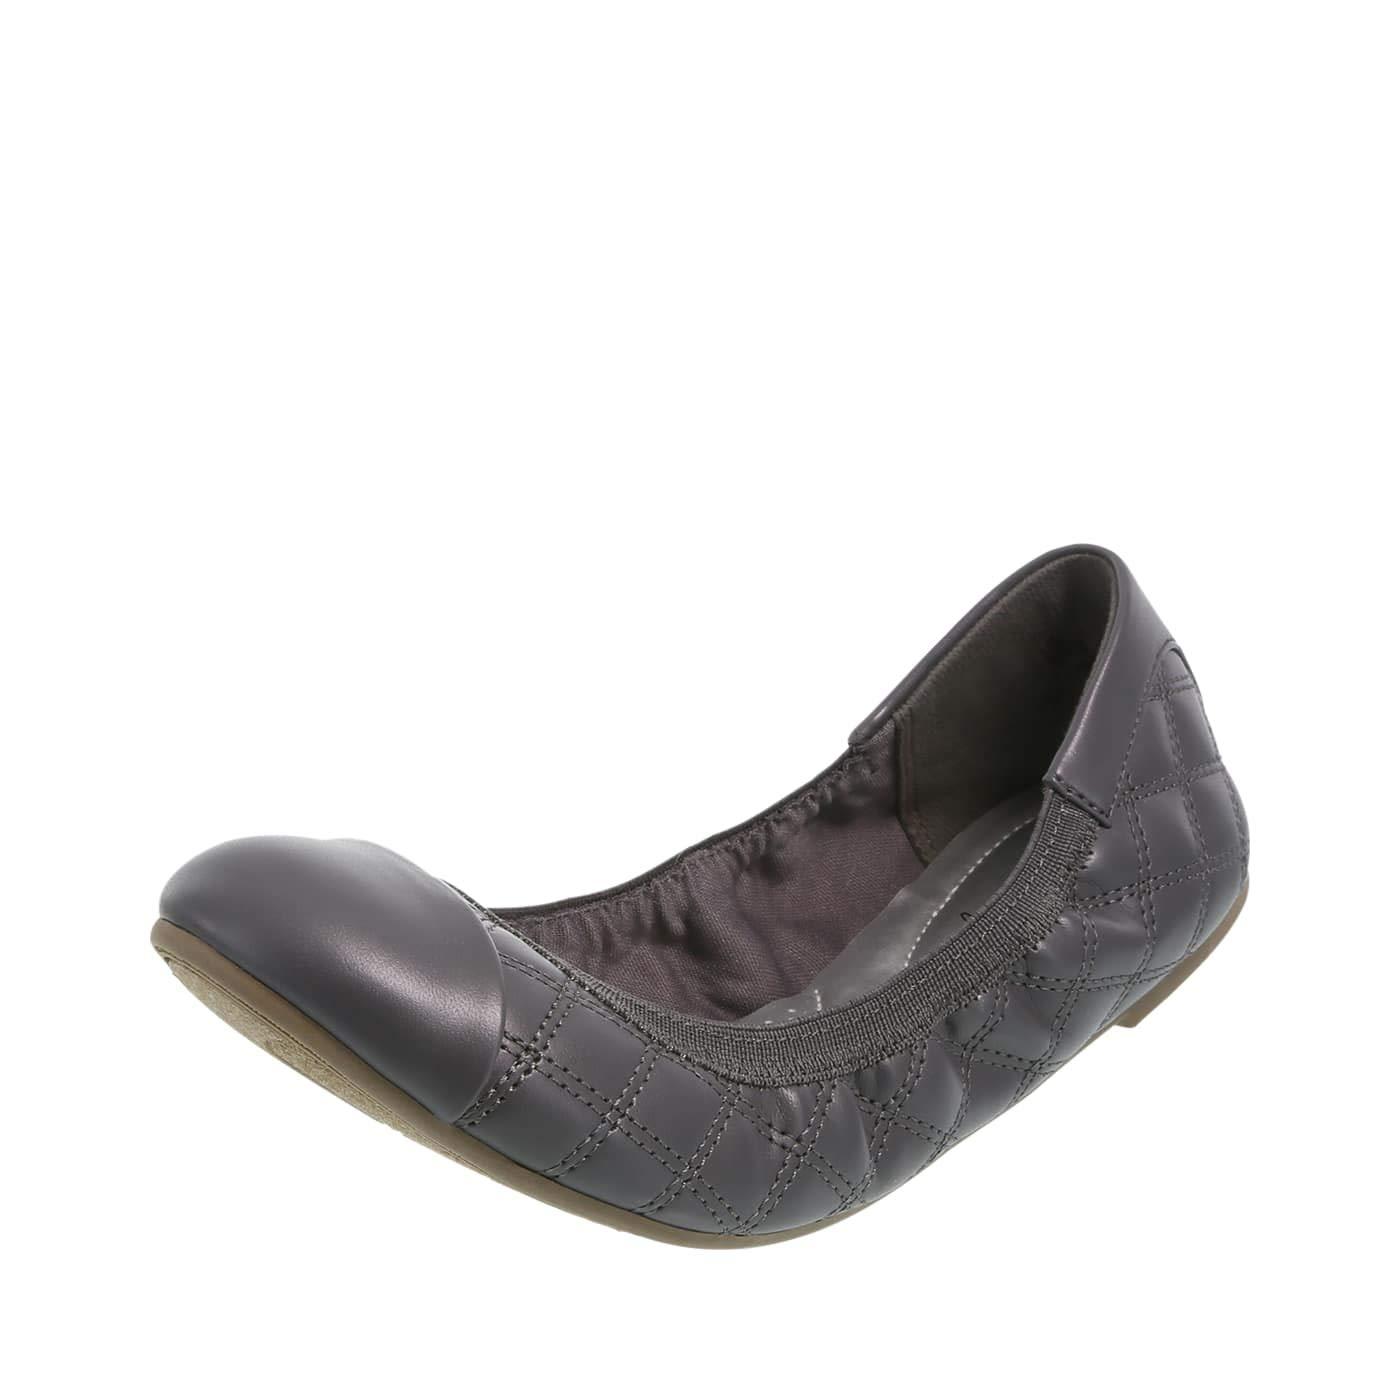 fd4853cff0fa dexflex Comfort Concrete Grey Quilted Women s Claire Scrunch Flat 6.5 Wide